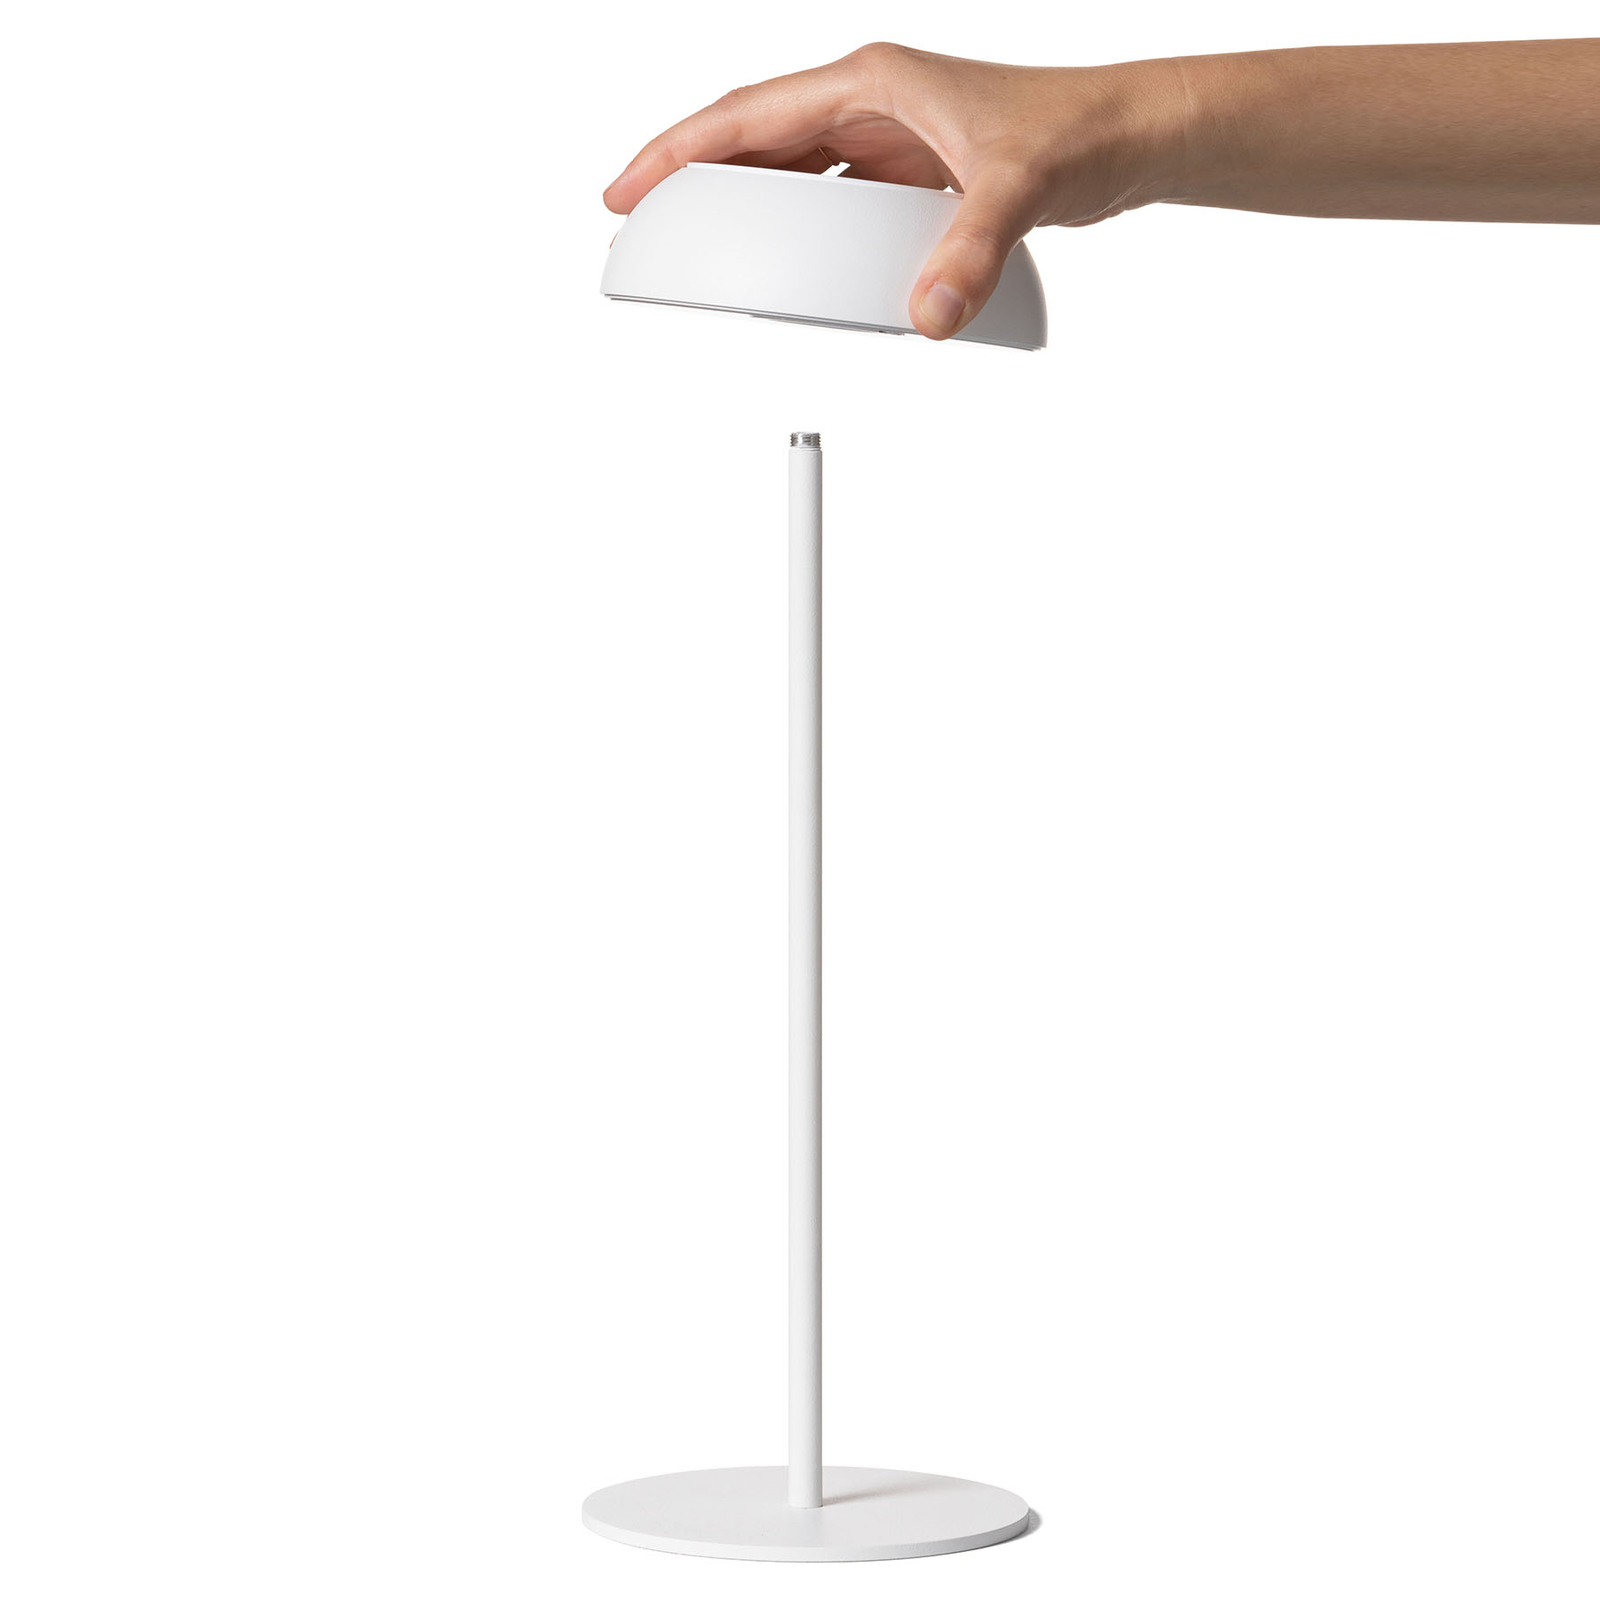 Axolight Float lampe à poser designer LED, blanche